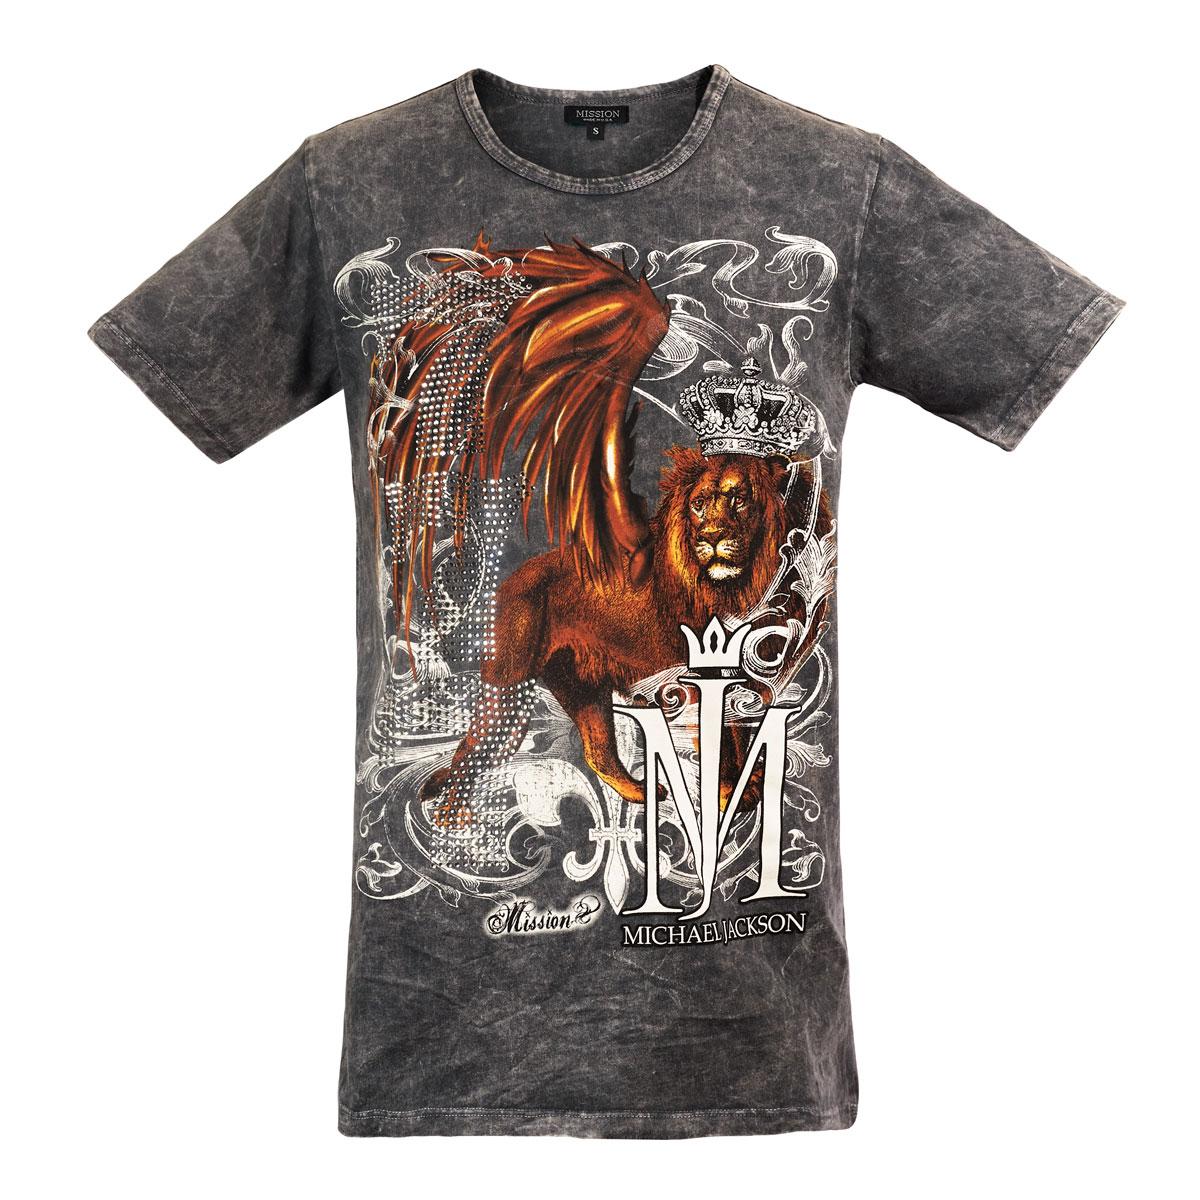 Michael Jackson x Mission Crystal Lion T-Shirt - Black